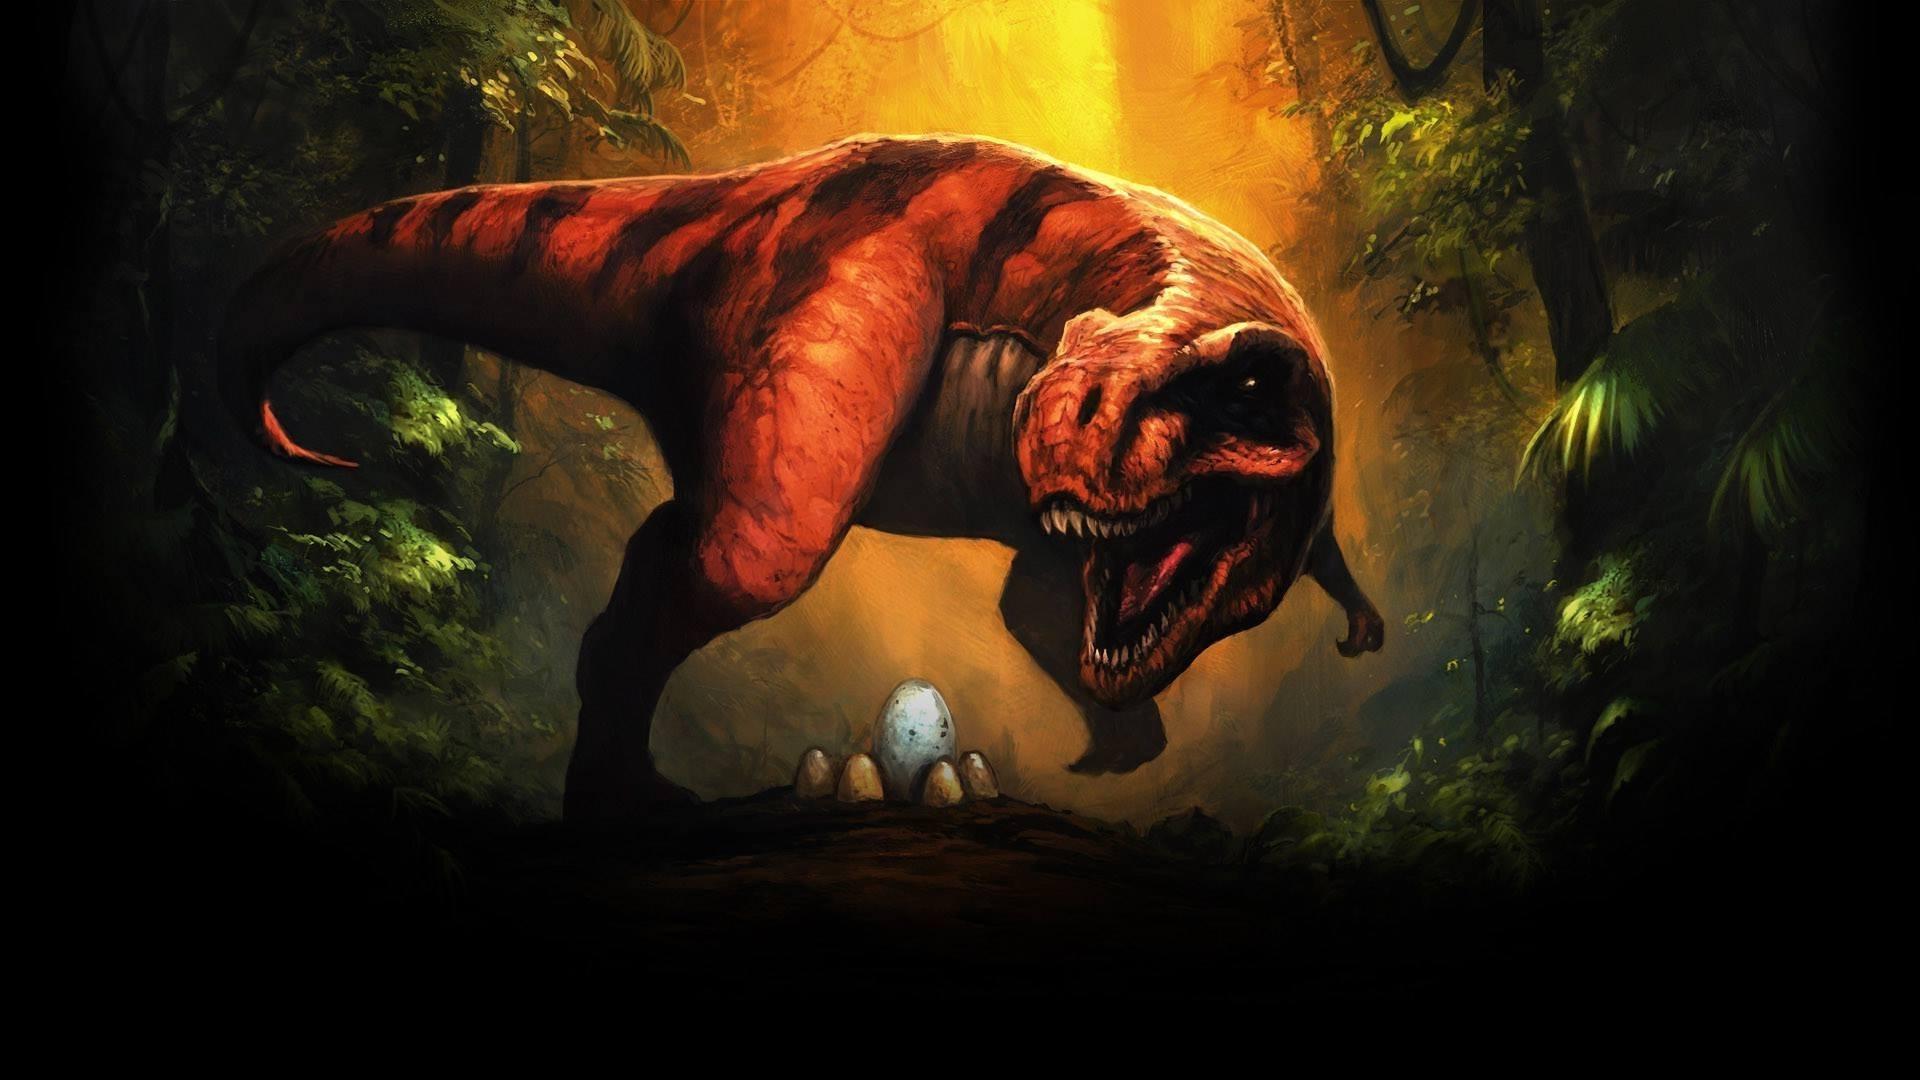 Res: 1920x1080, dinosaurs fantasy art tyrannosaurus rex eggs wallpaper and background